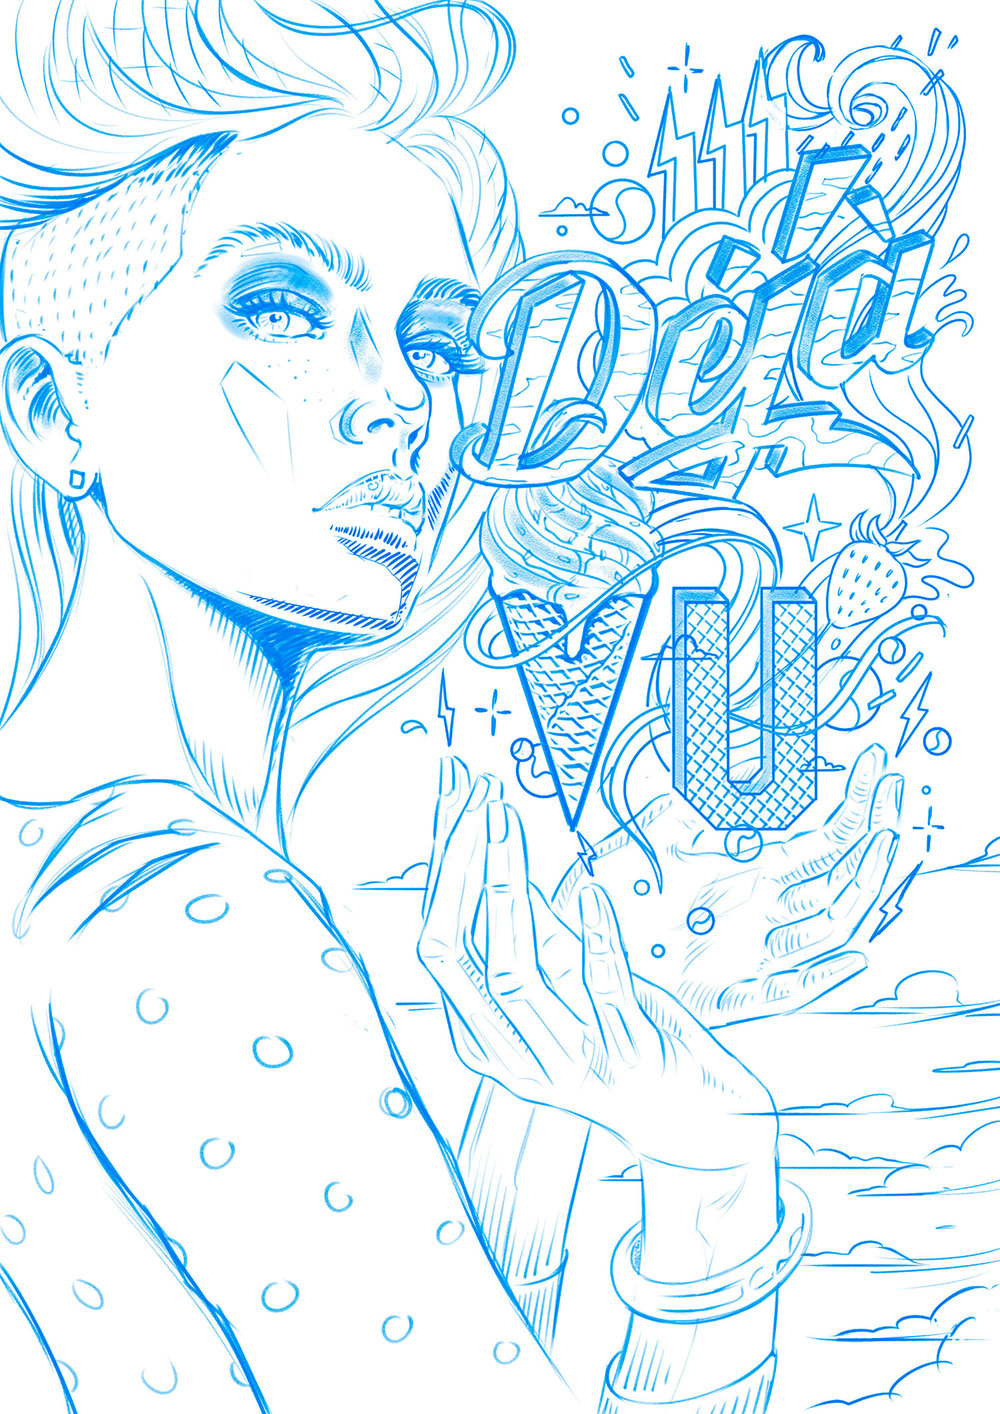 Poster-02---Deja-Vu---Sketch-copy.jpg